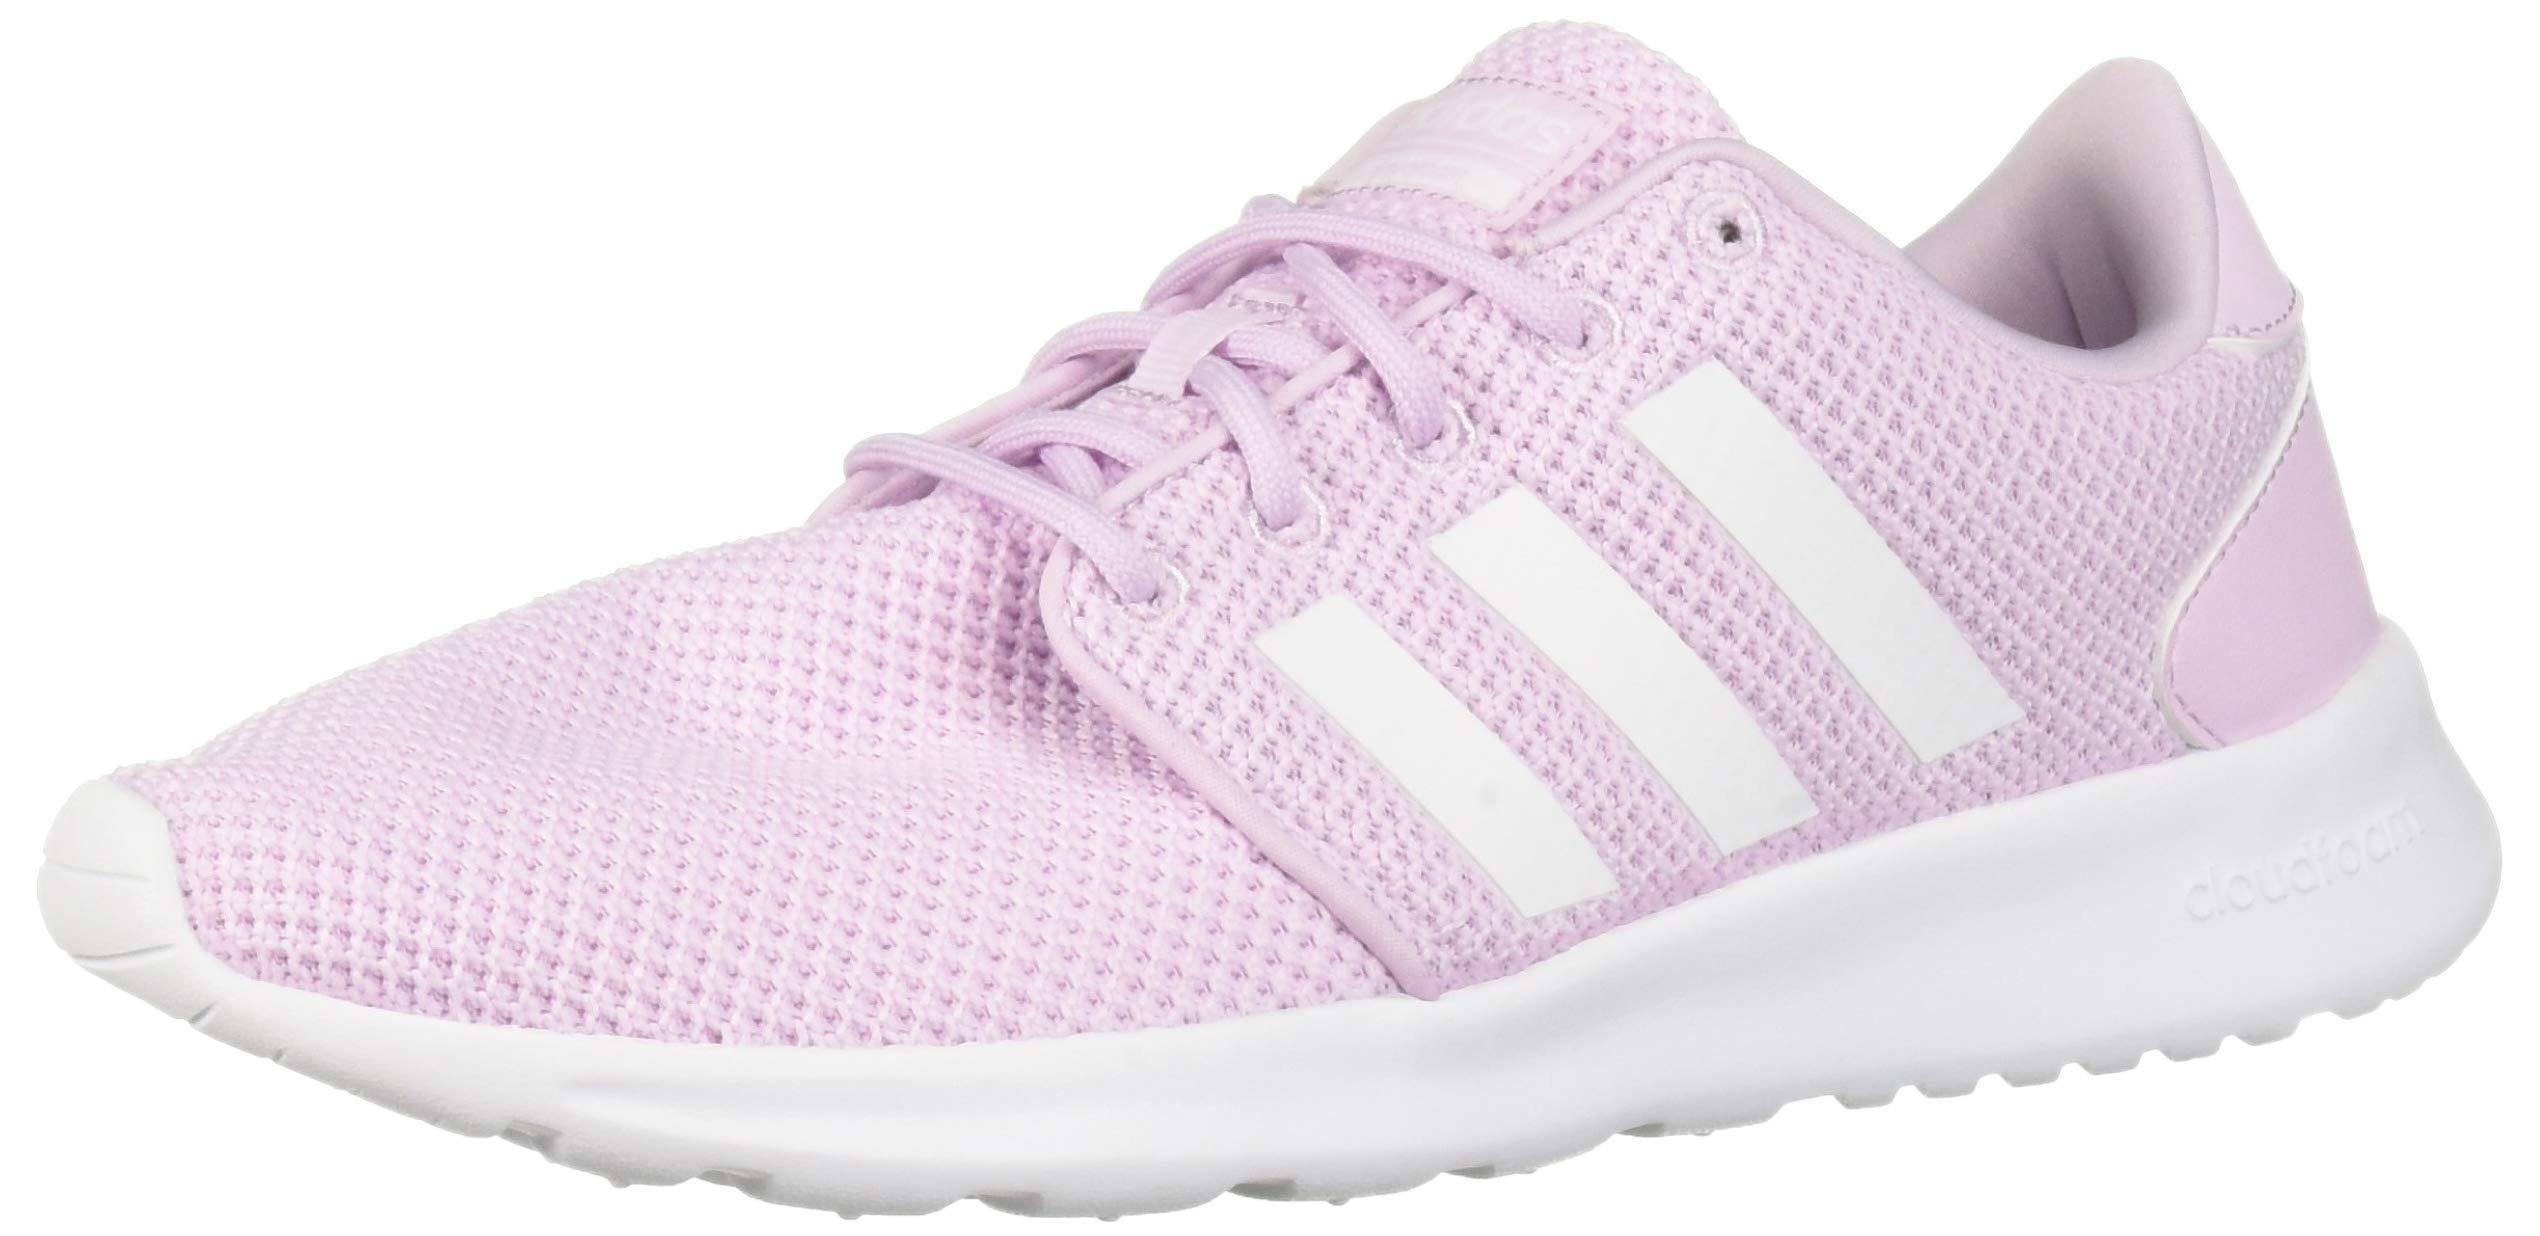 adidas Women's Cloudfoam QT Racer Shoes, White/aero Pink, 6.5 M US by adidas